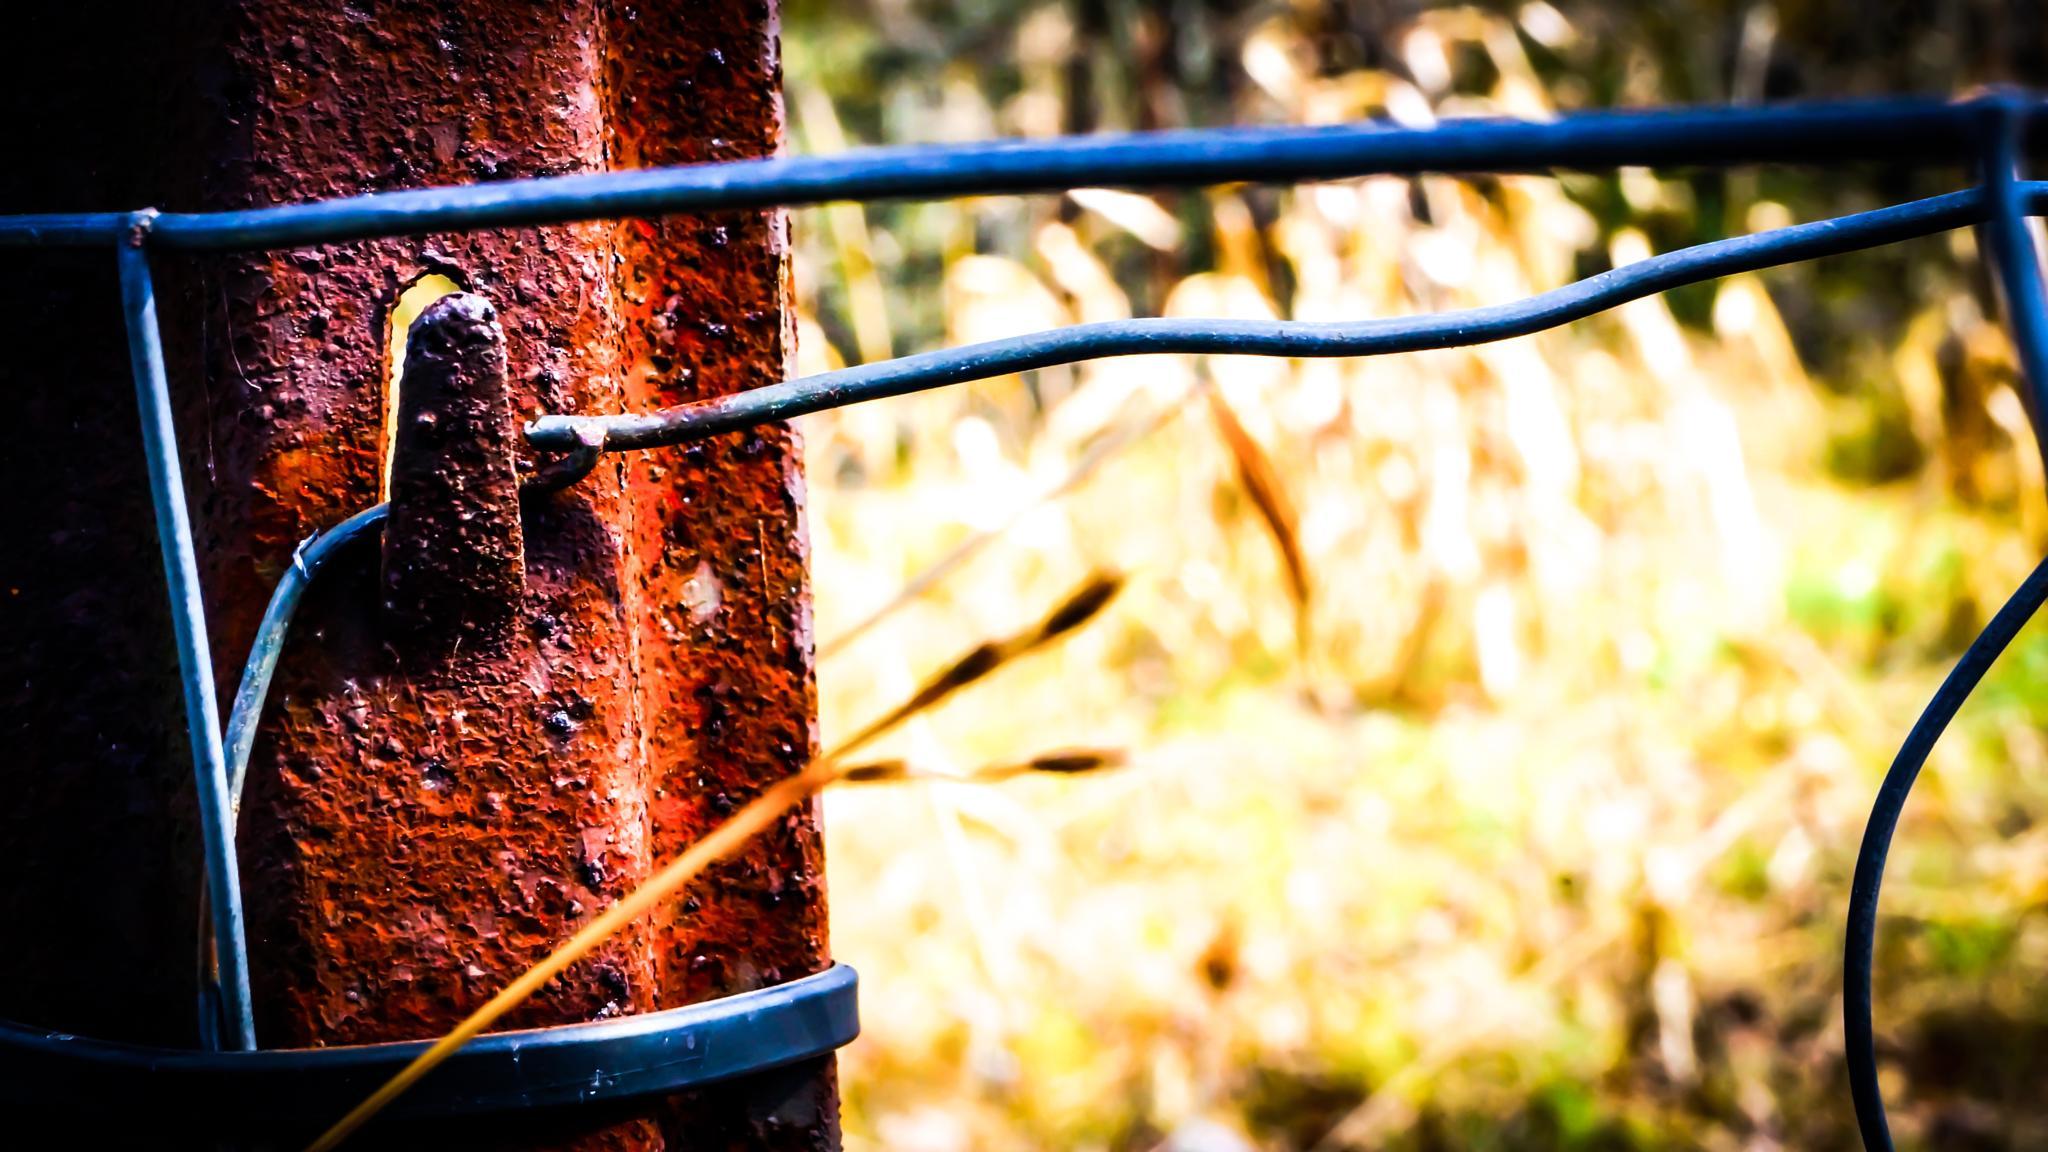 Rusty fence by douglas.hamilton.984